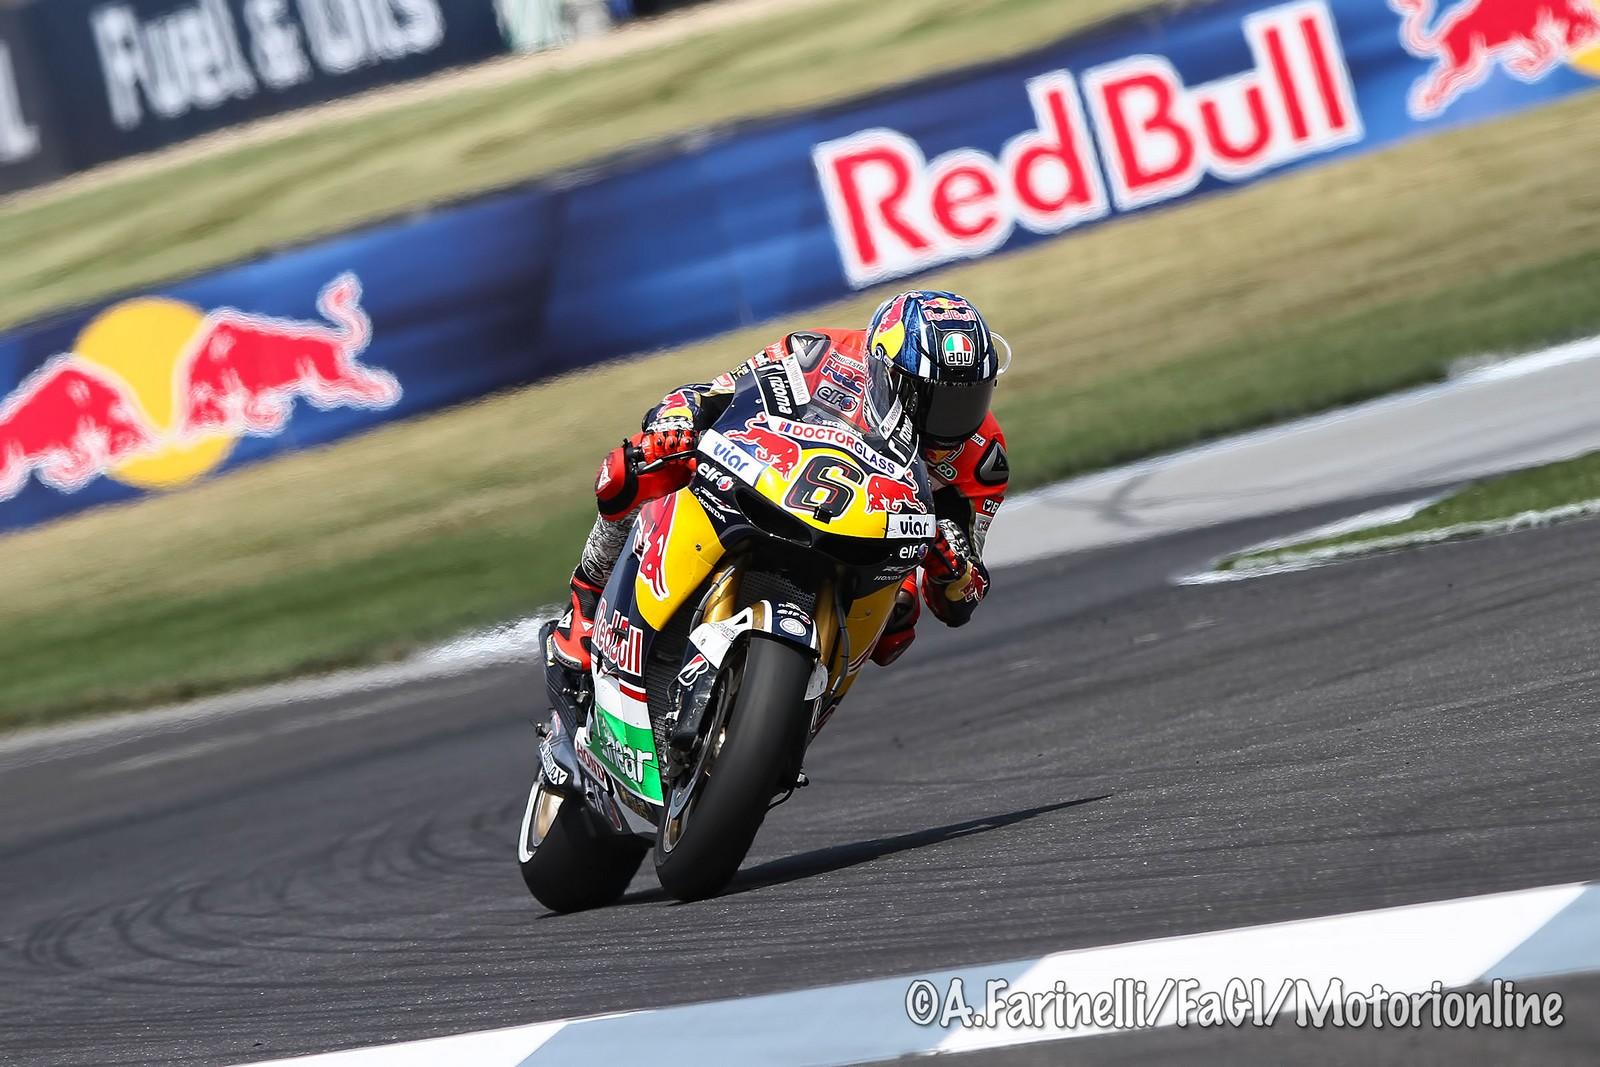 MotoGP Indianapolis 2013RACE Foto MotoGP alta risoluzione 23 di 95